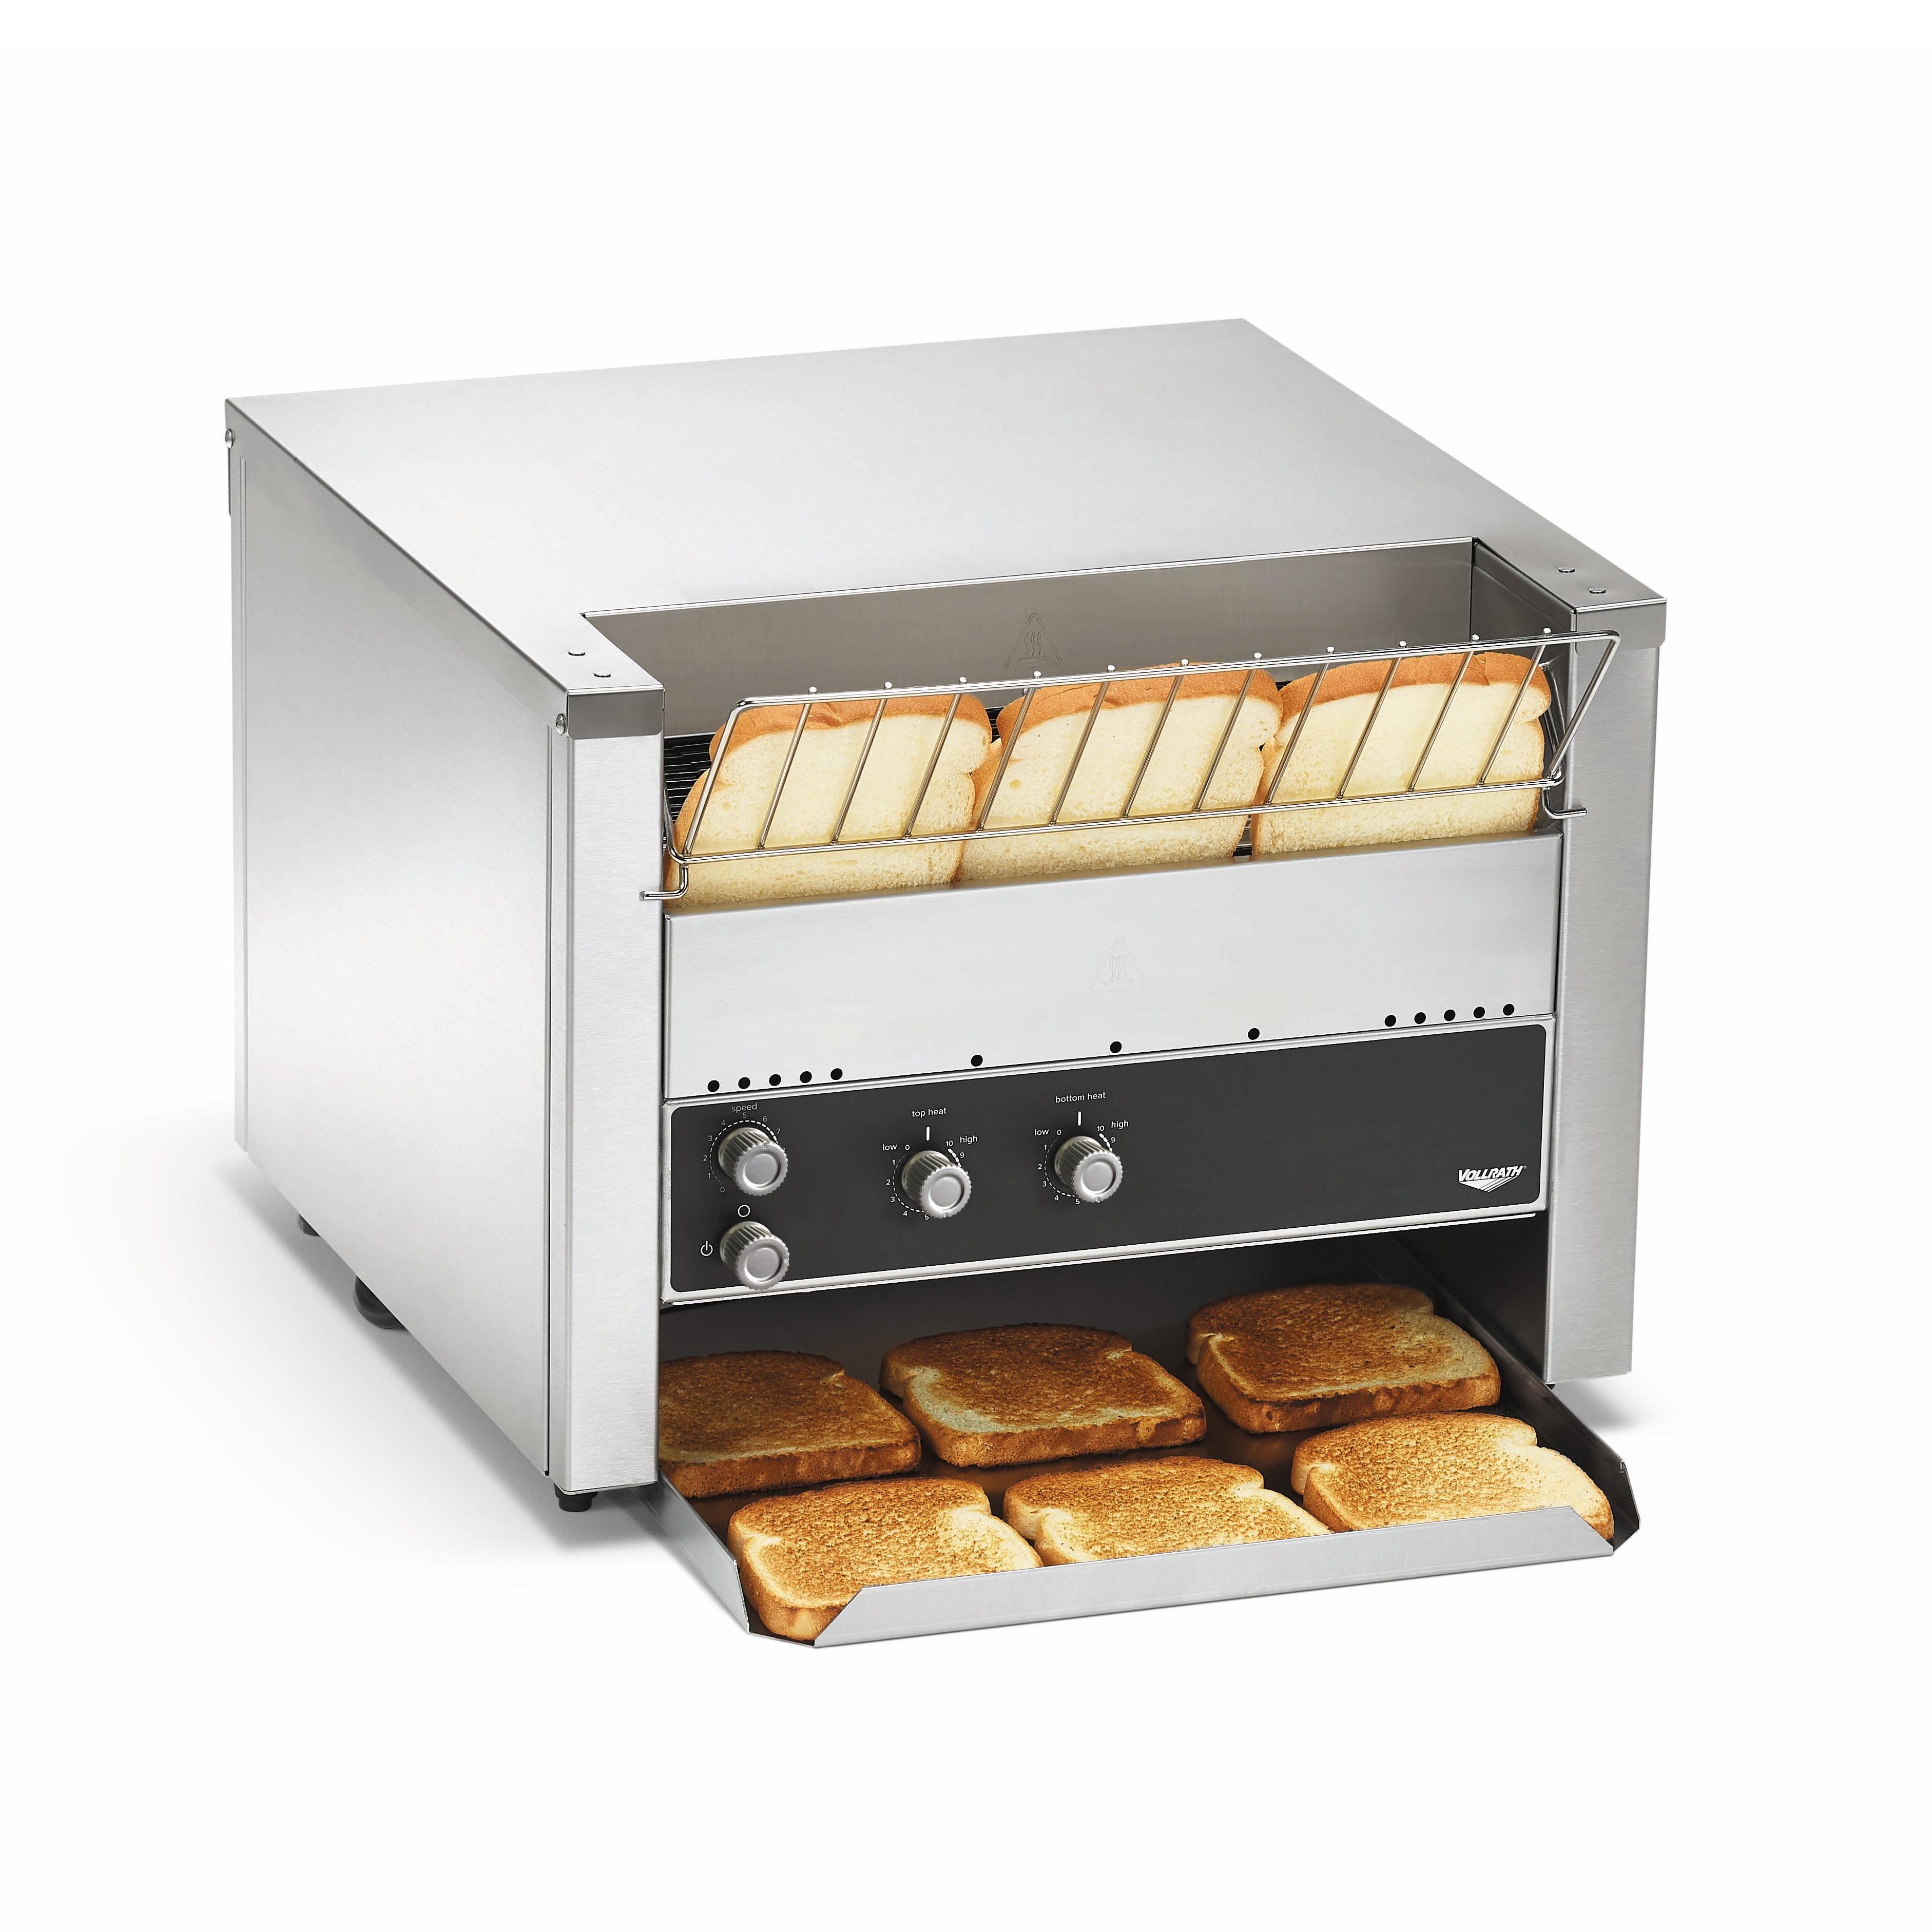 Vollrath CT4-2201000 toaster, conveyor type